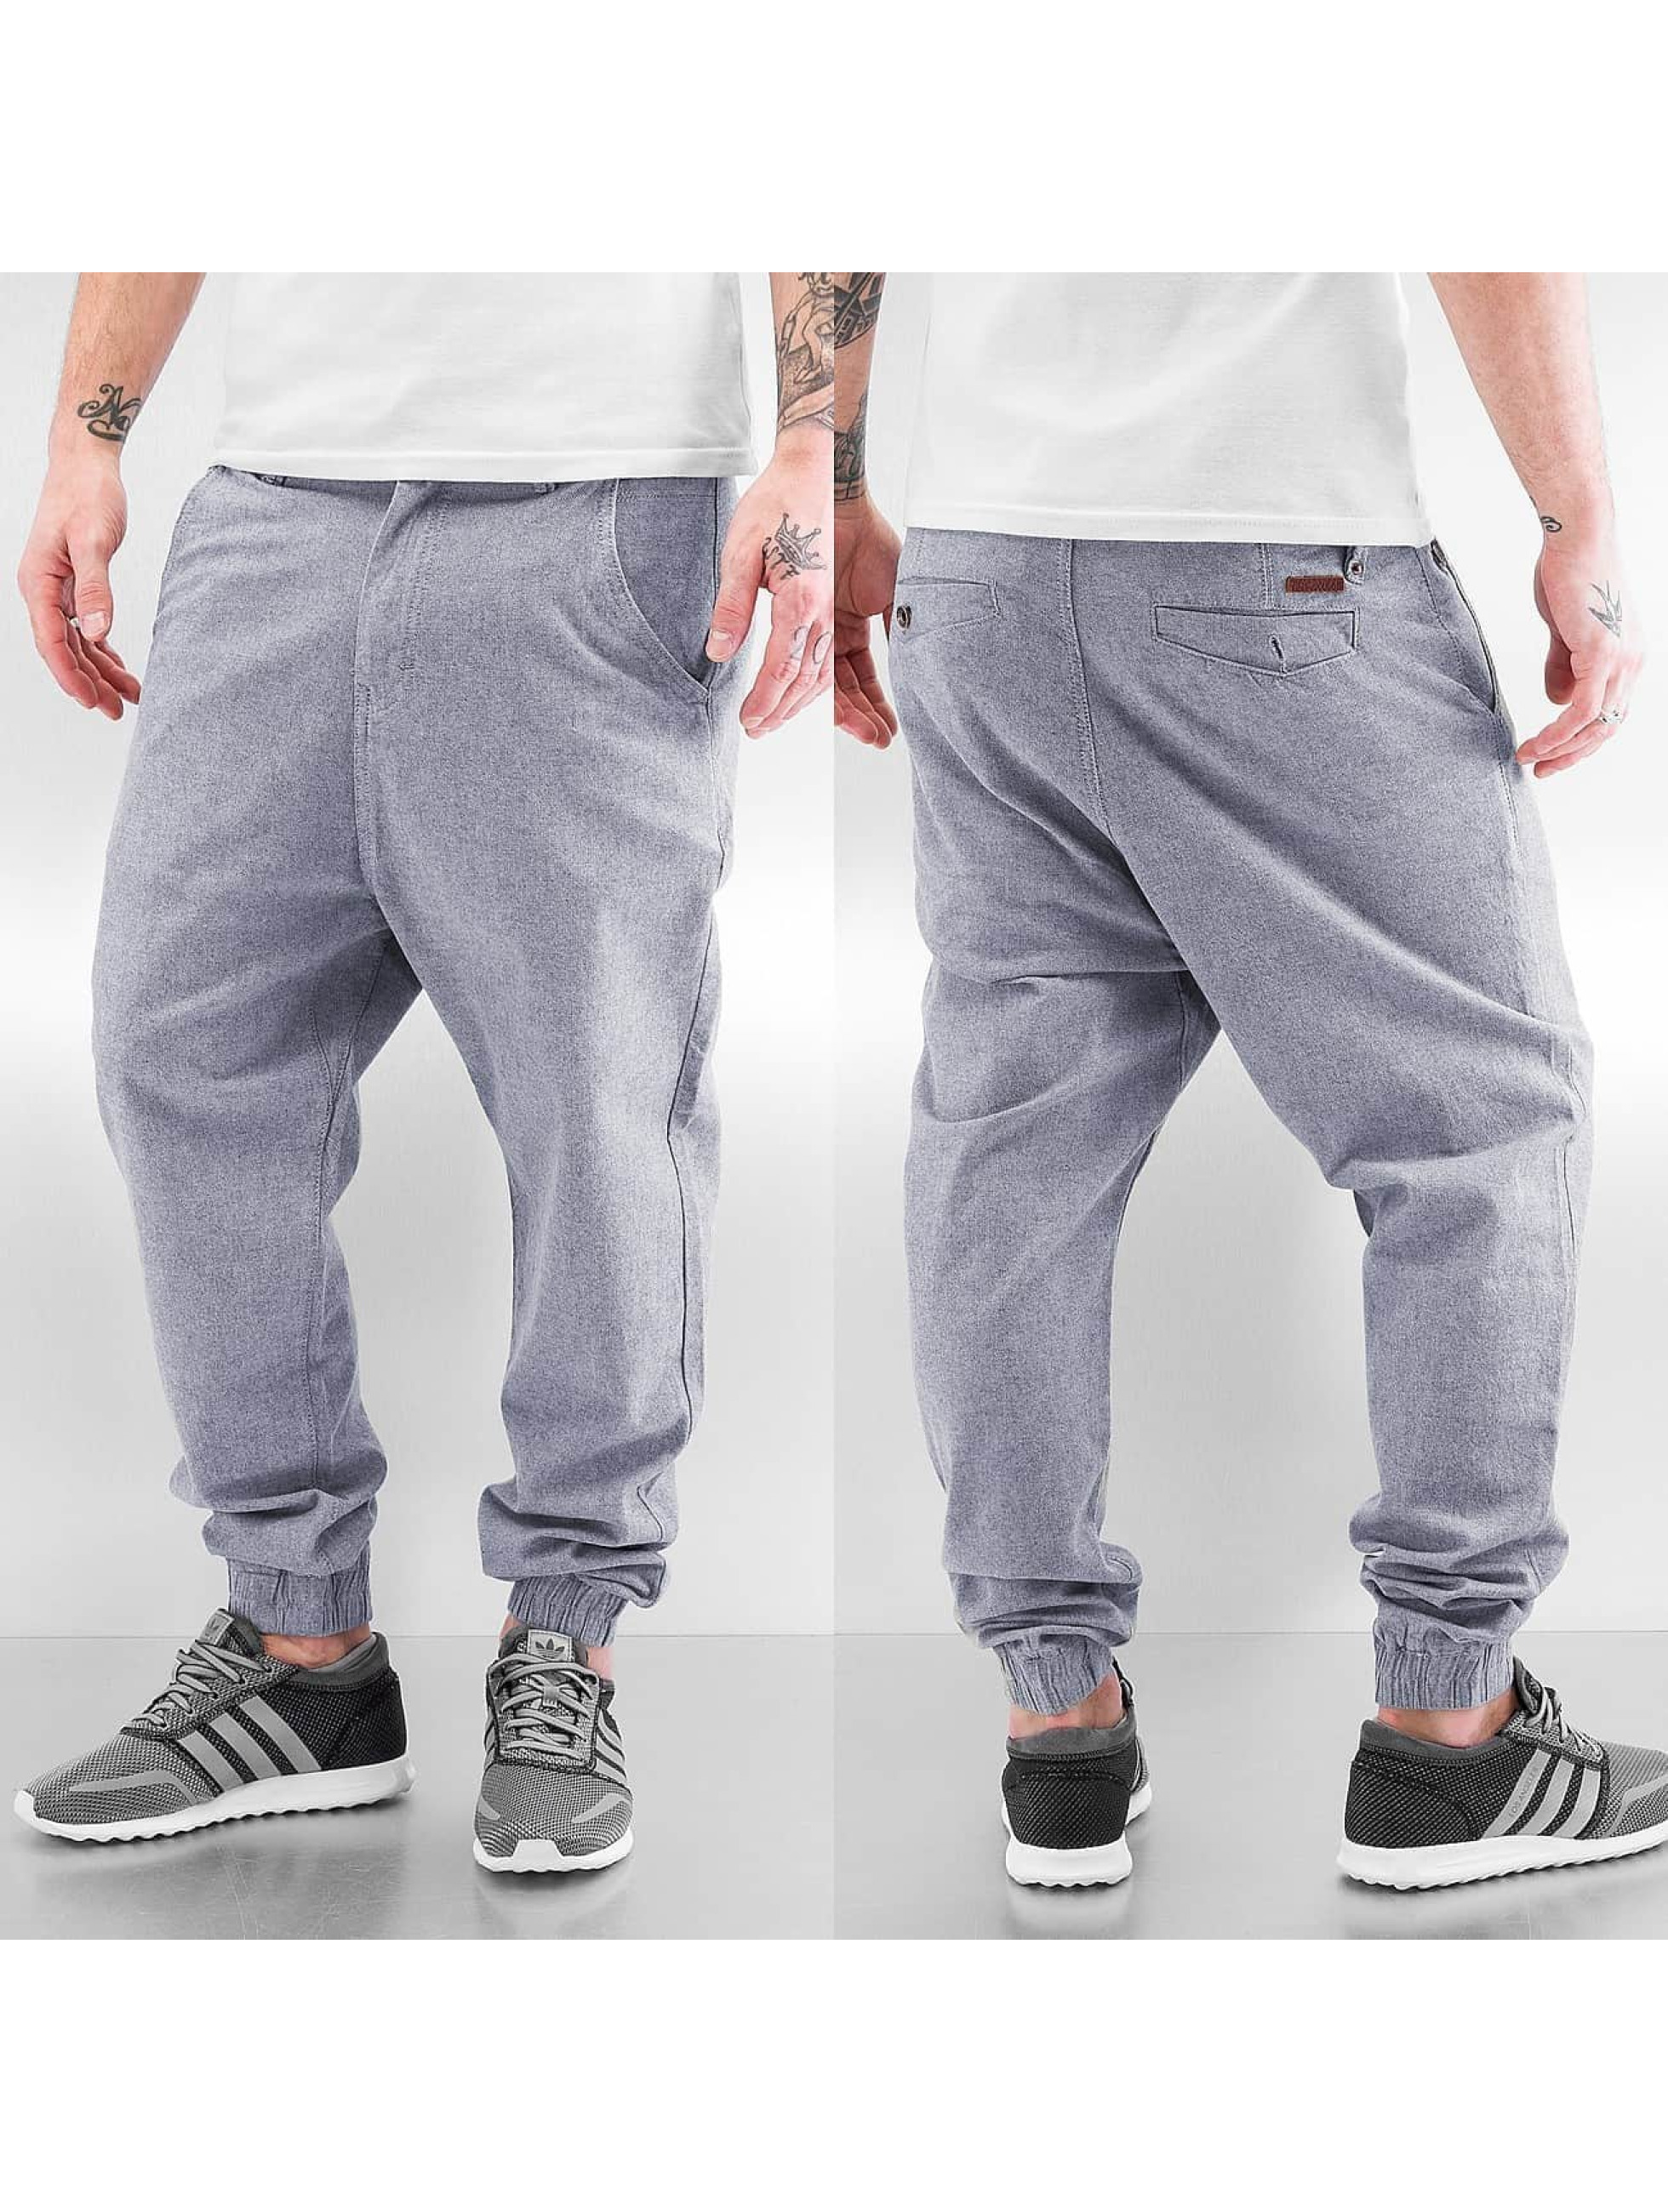 Rocawear Pantalon chino New Jogger Non Denim bleu